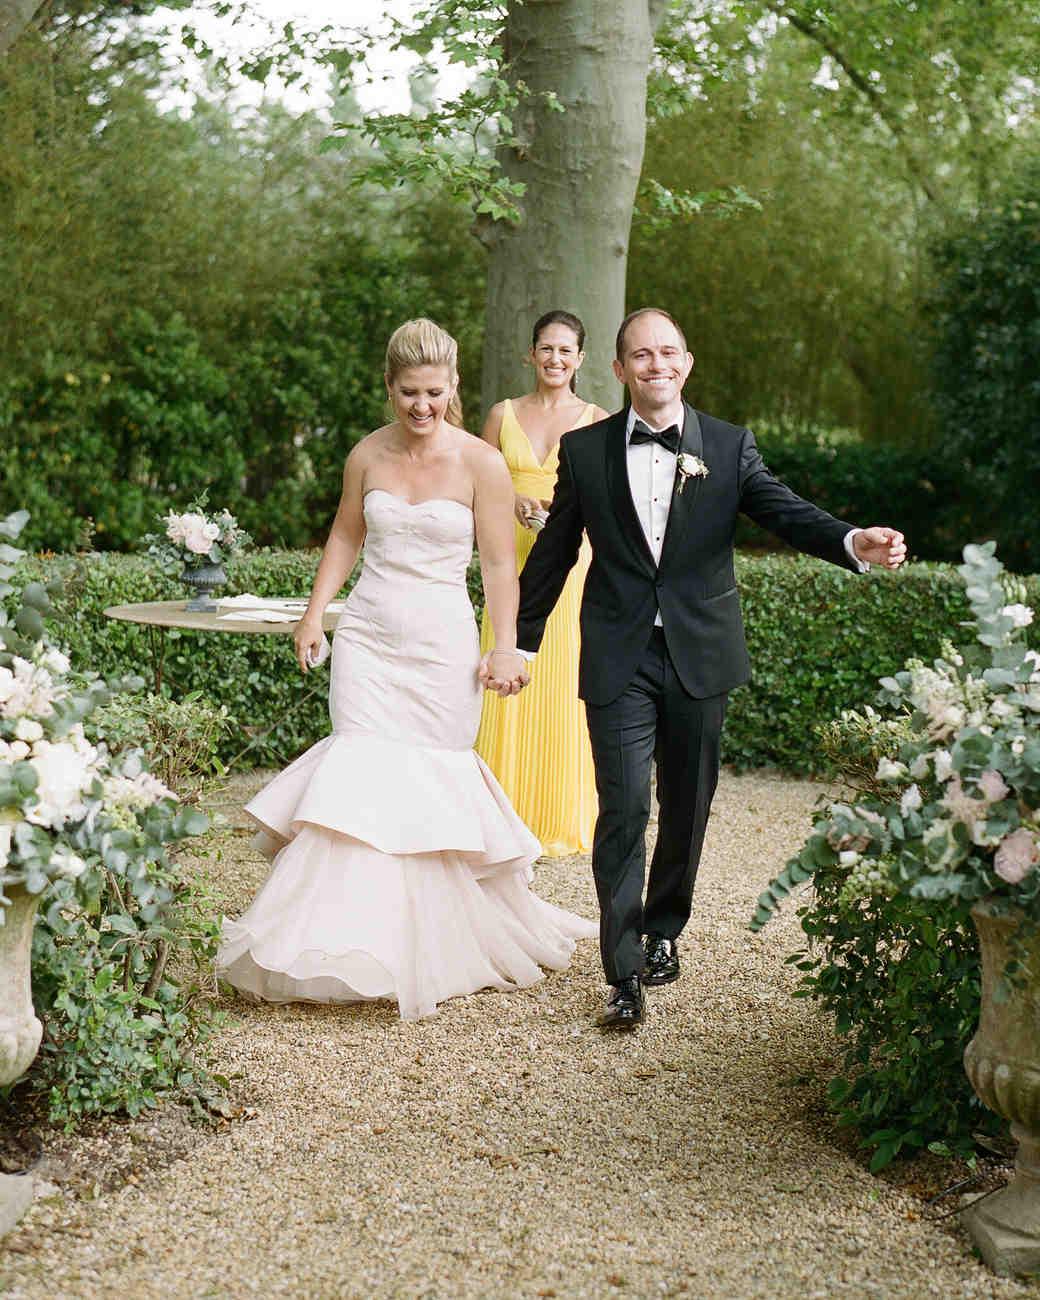 julie-chris-wedding-ceremony-1026-s12649-0216.jpg